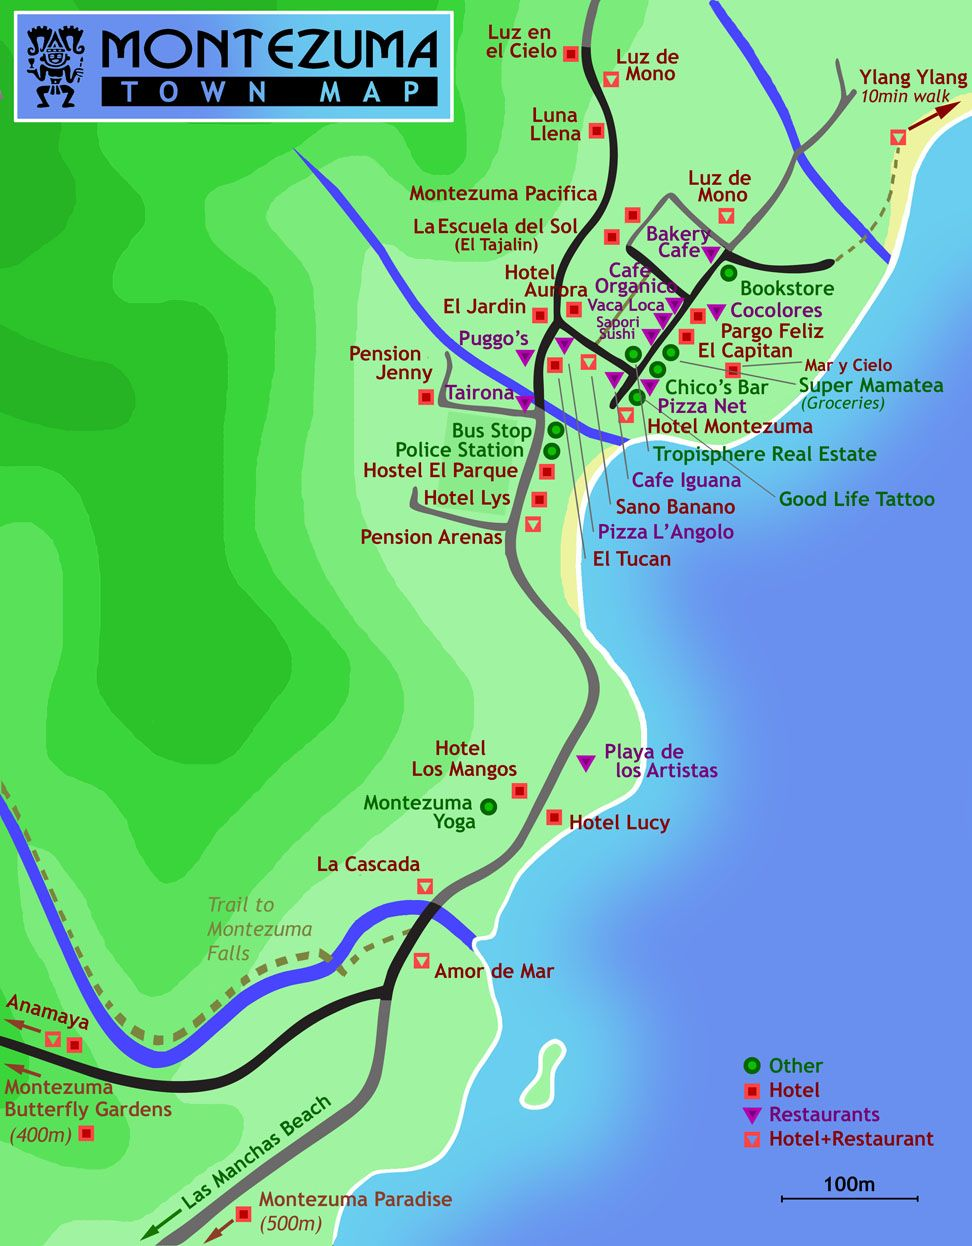 playa montezuma costa rica map Montezuma Costa Rica Montezuma Costa Rica Costa Rica Map Costa Rica Vacation playa montezuma costa rica map